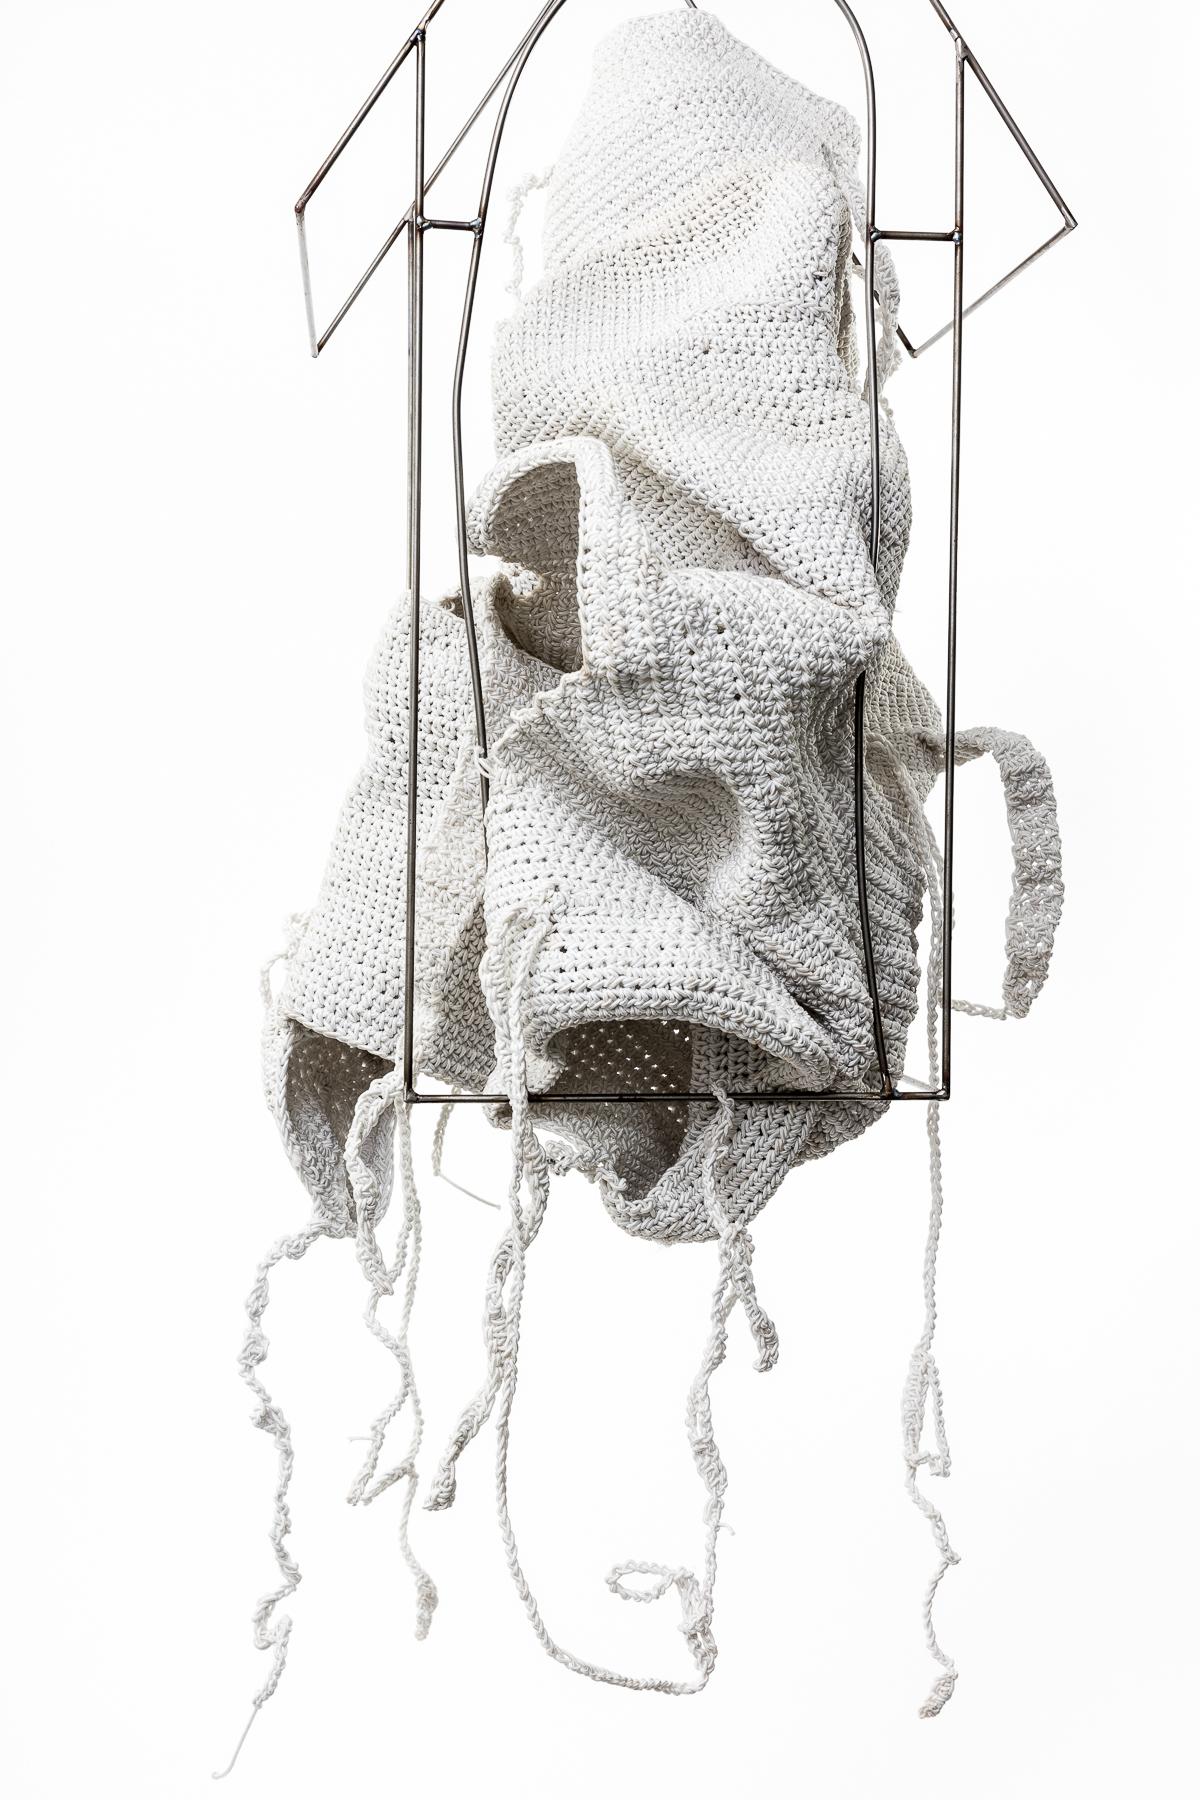 _DS_0136_Claudia-Maria Luenig_Skulpturen_web.jpg